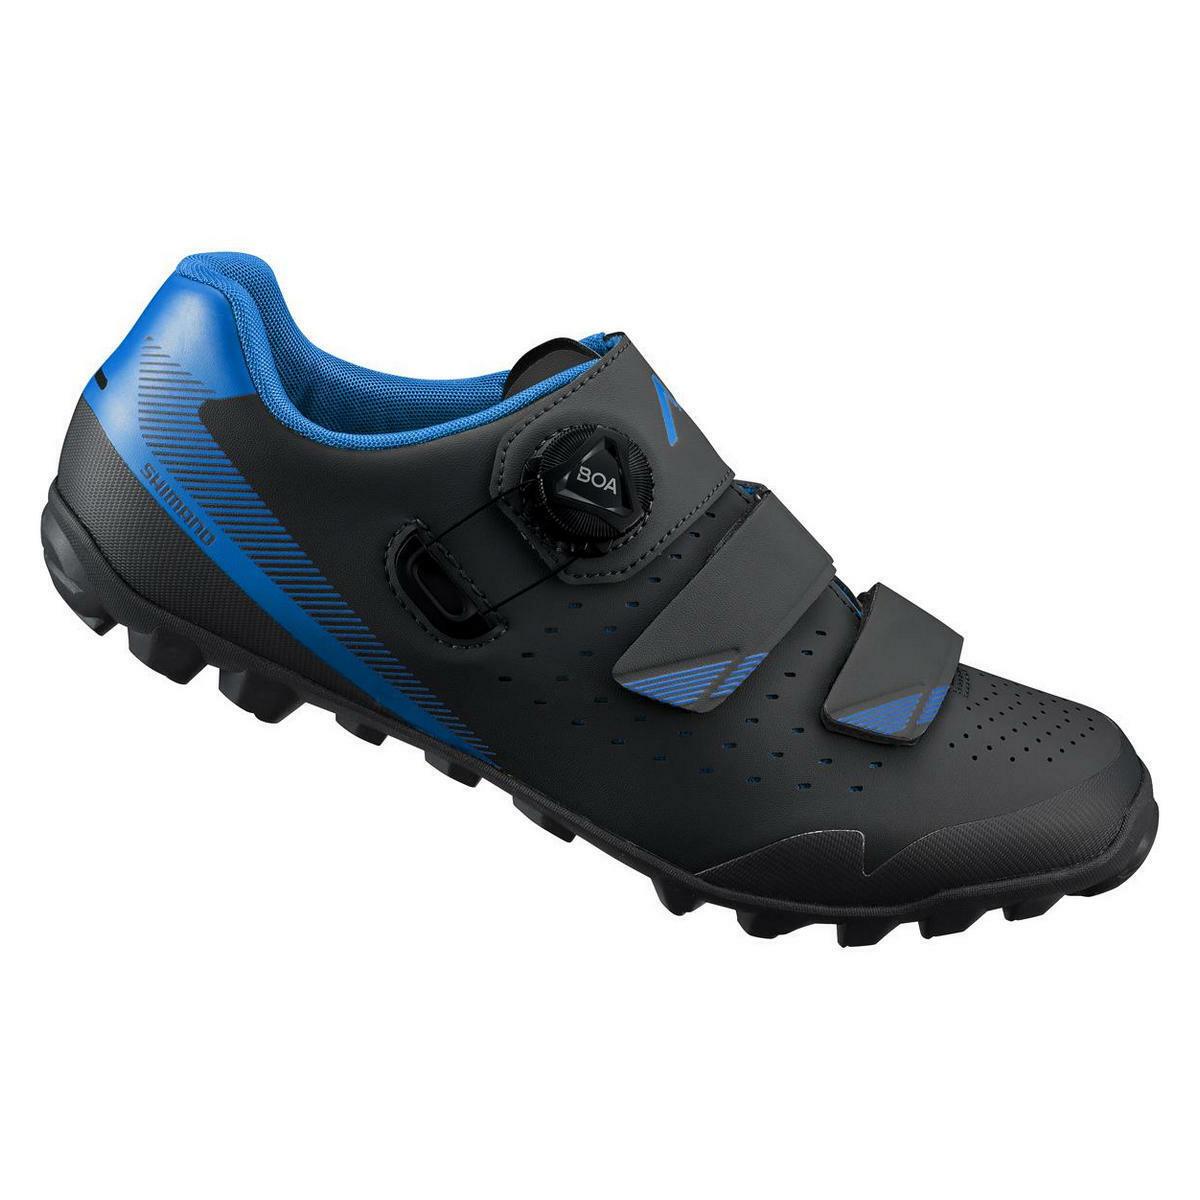 Scarpe mtb me400 shme400sl1 blu 2019 SHIMANO scarpe bici